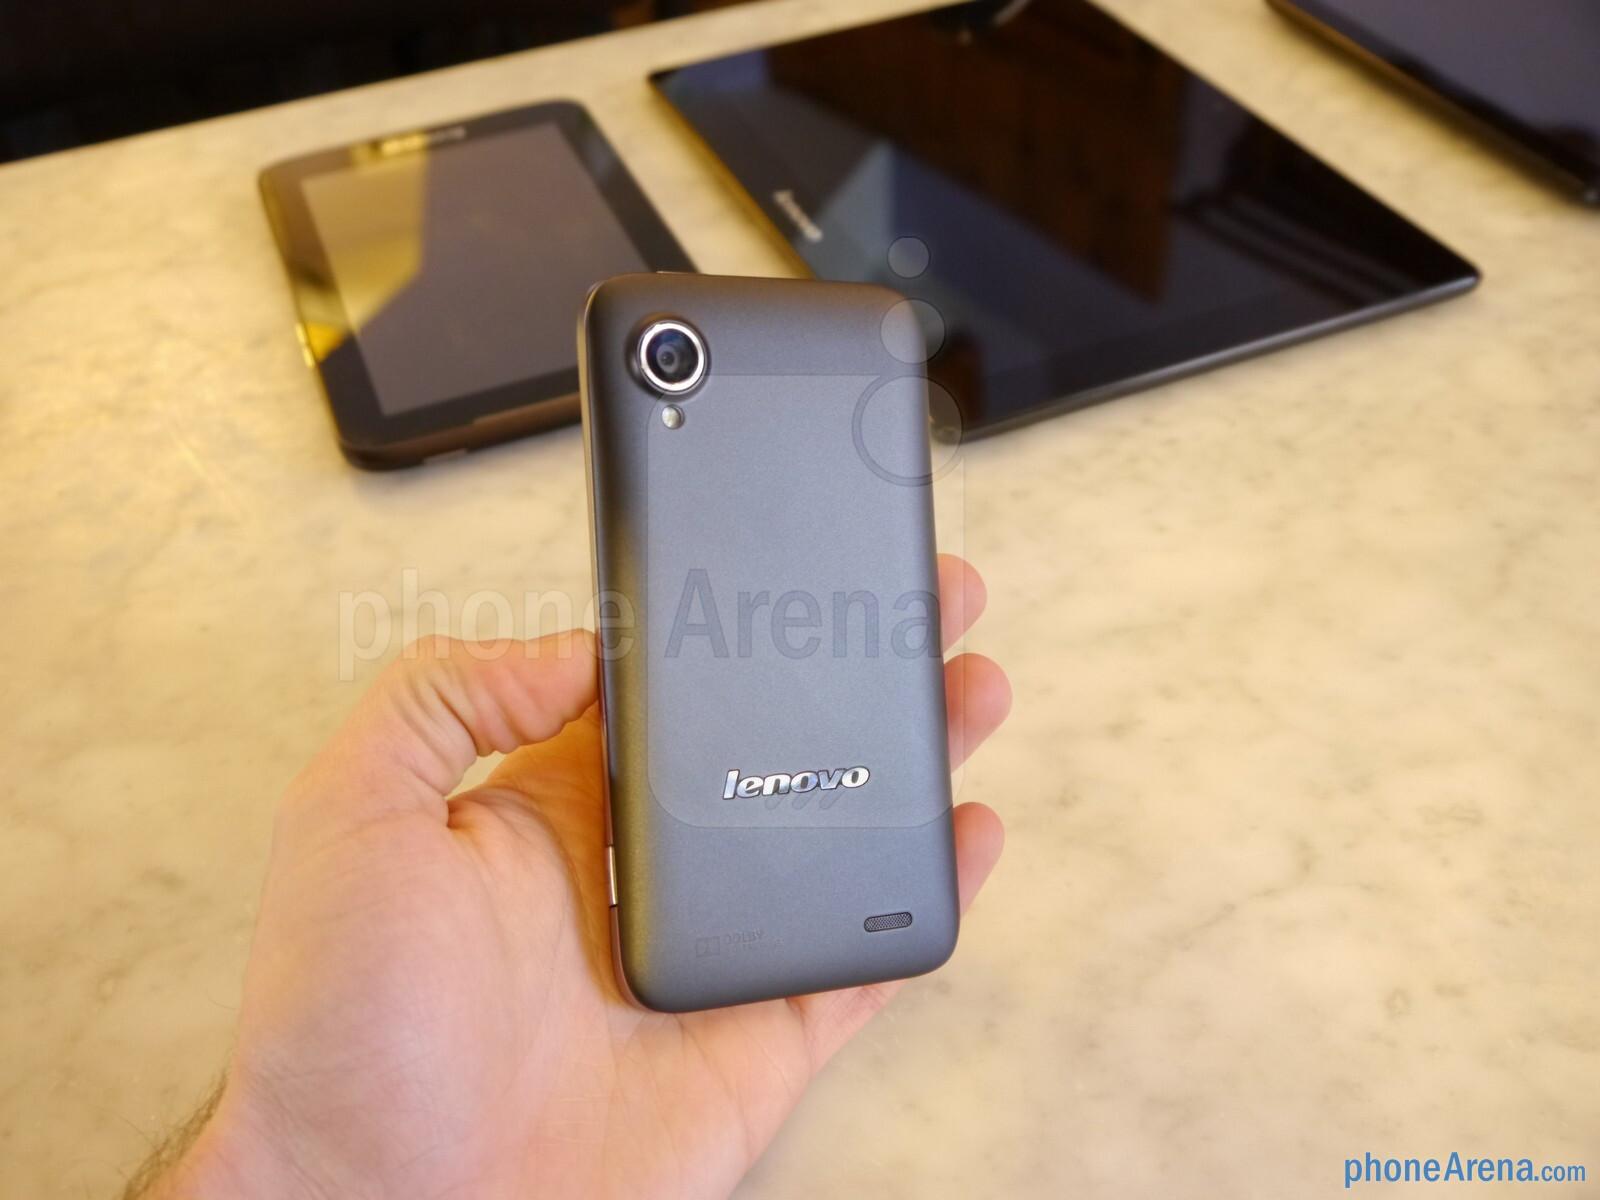 Lenovo IdeaPhone S720 hands-on